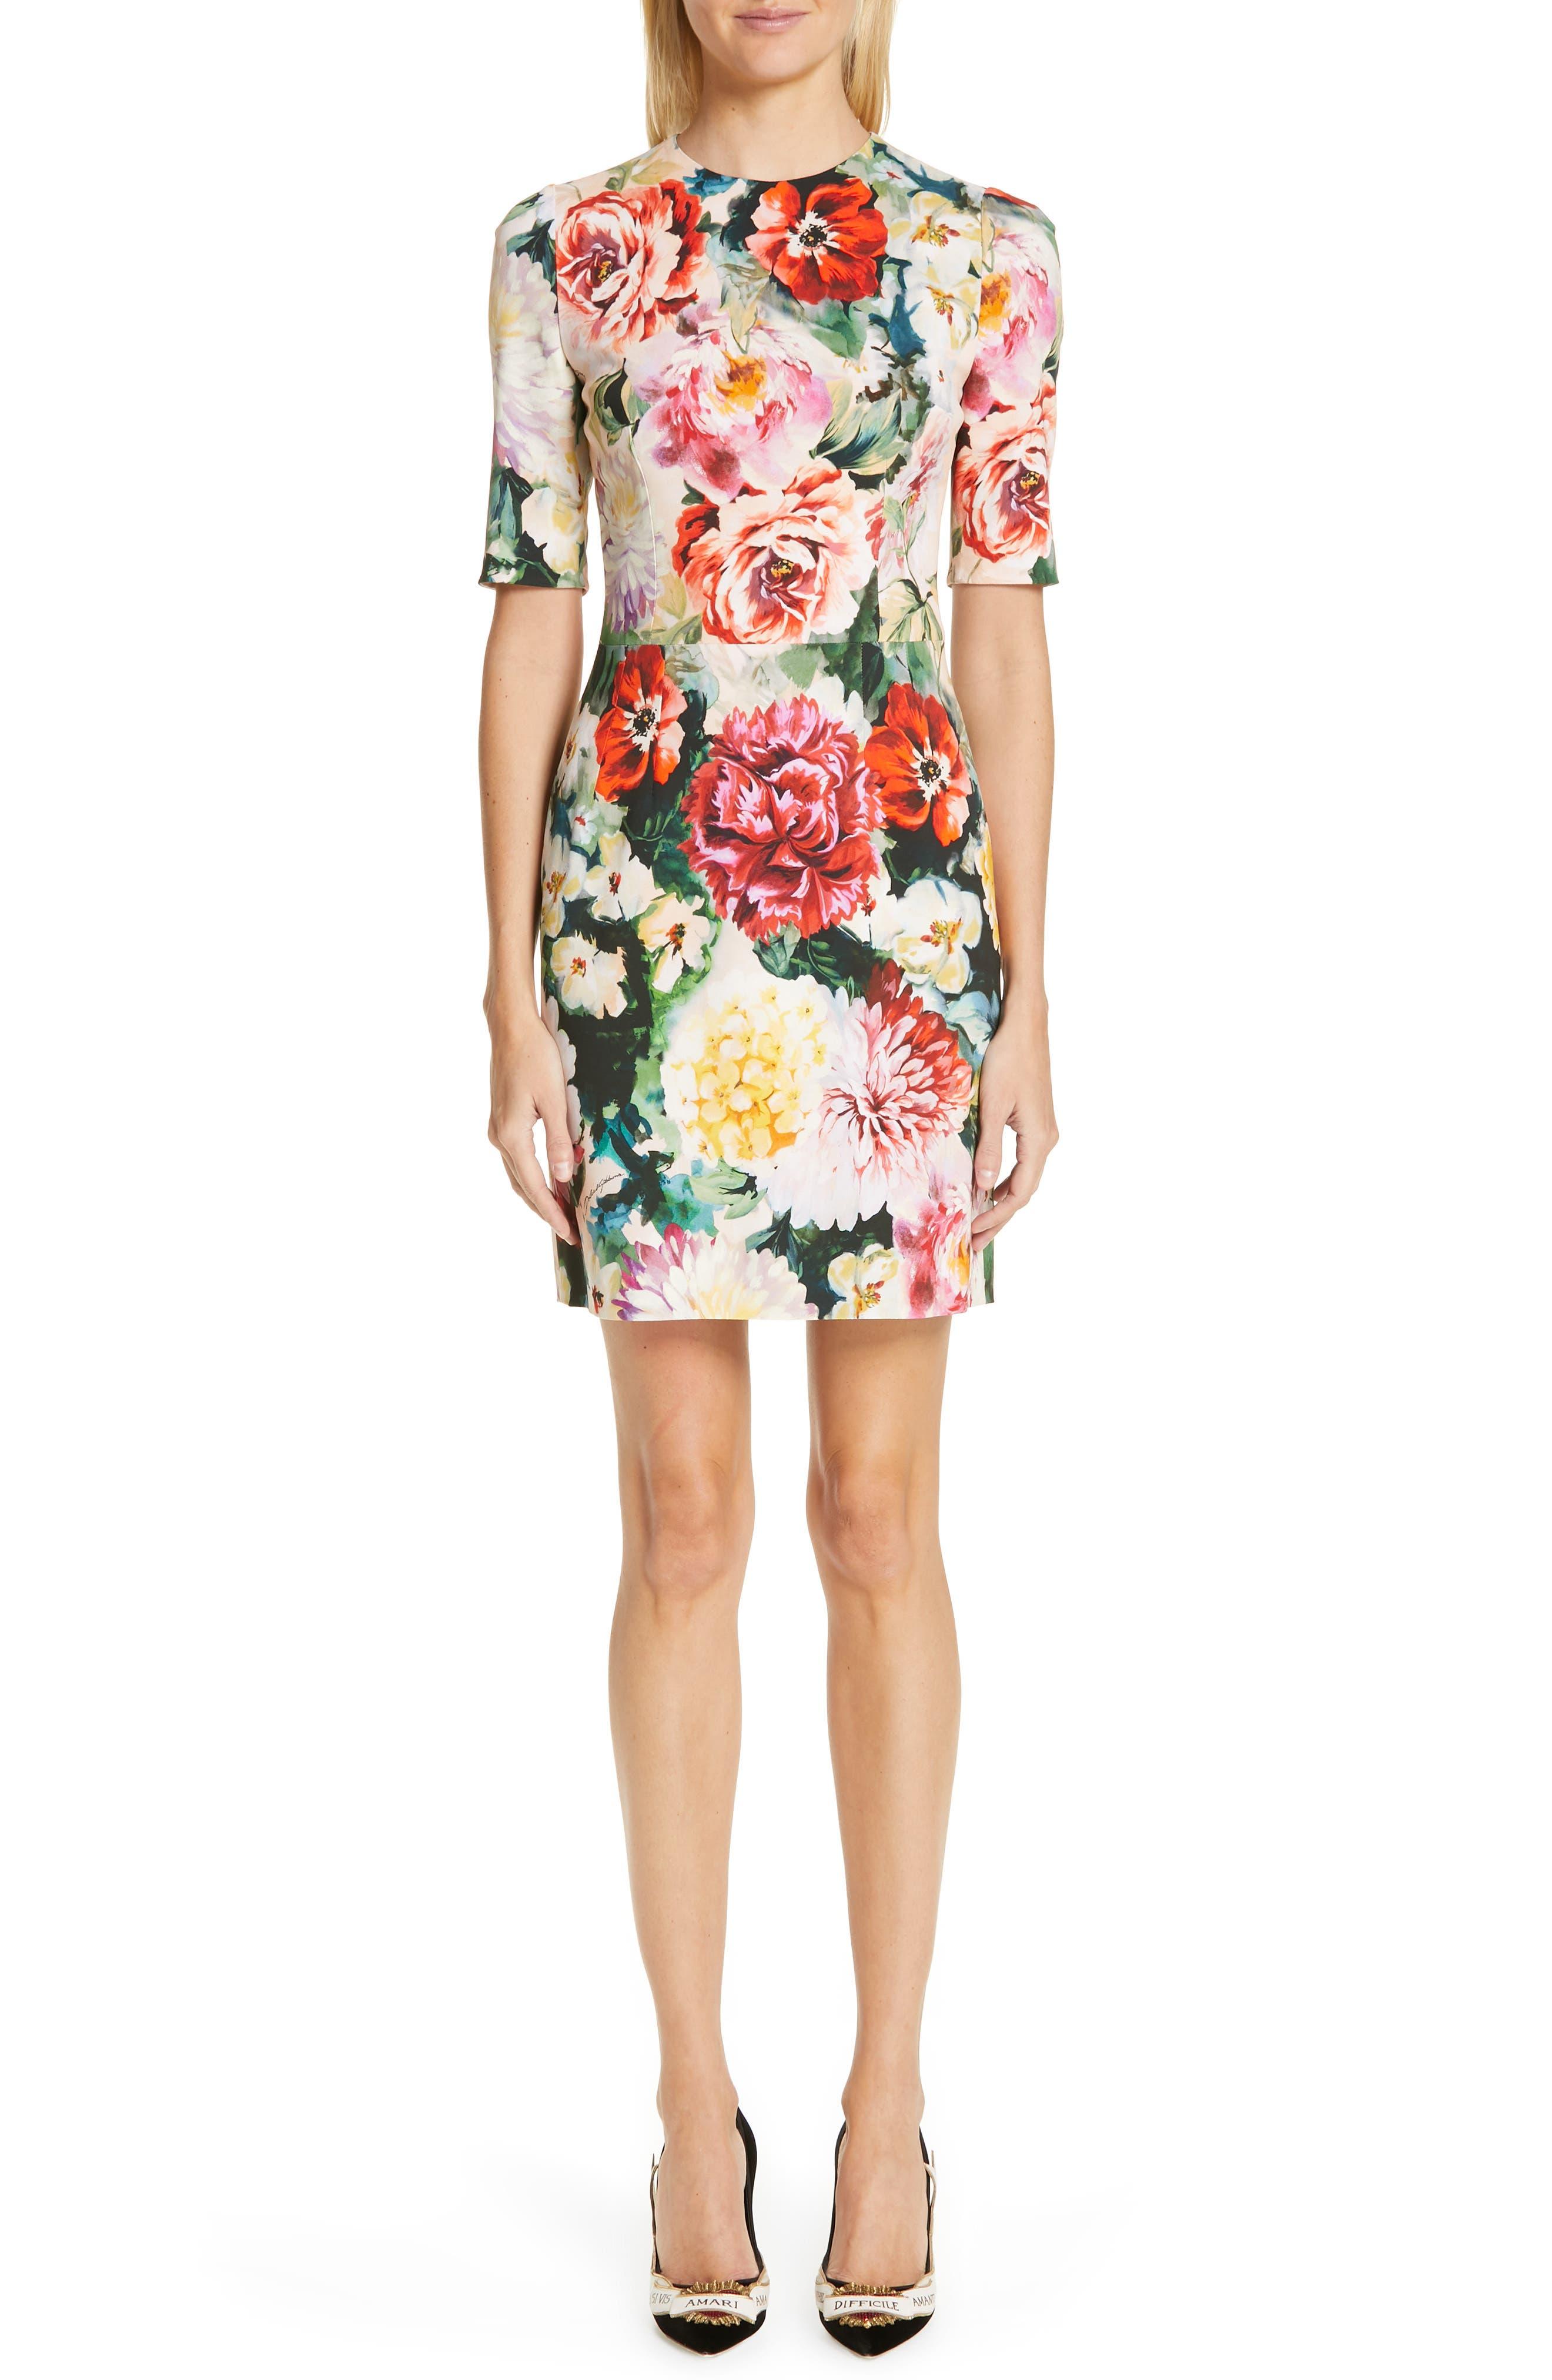 Dolce & gabbana Floral Print Cady Dress, 8 IT - Pink